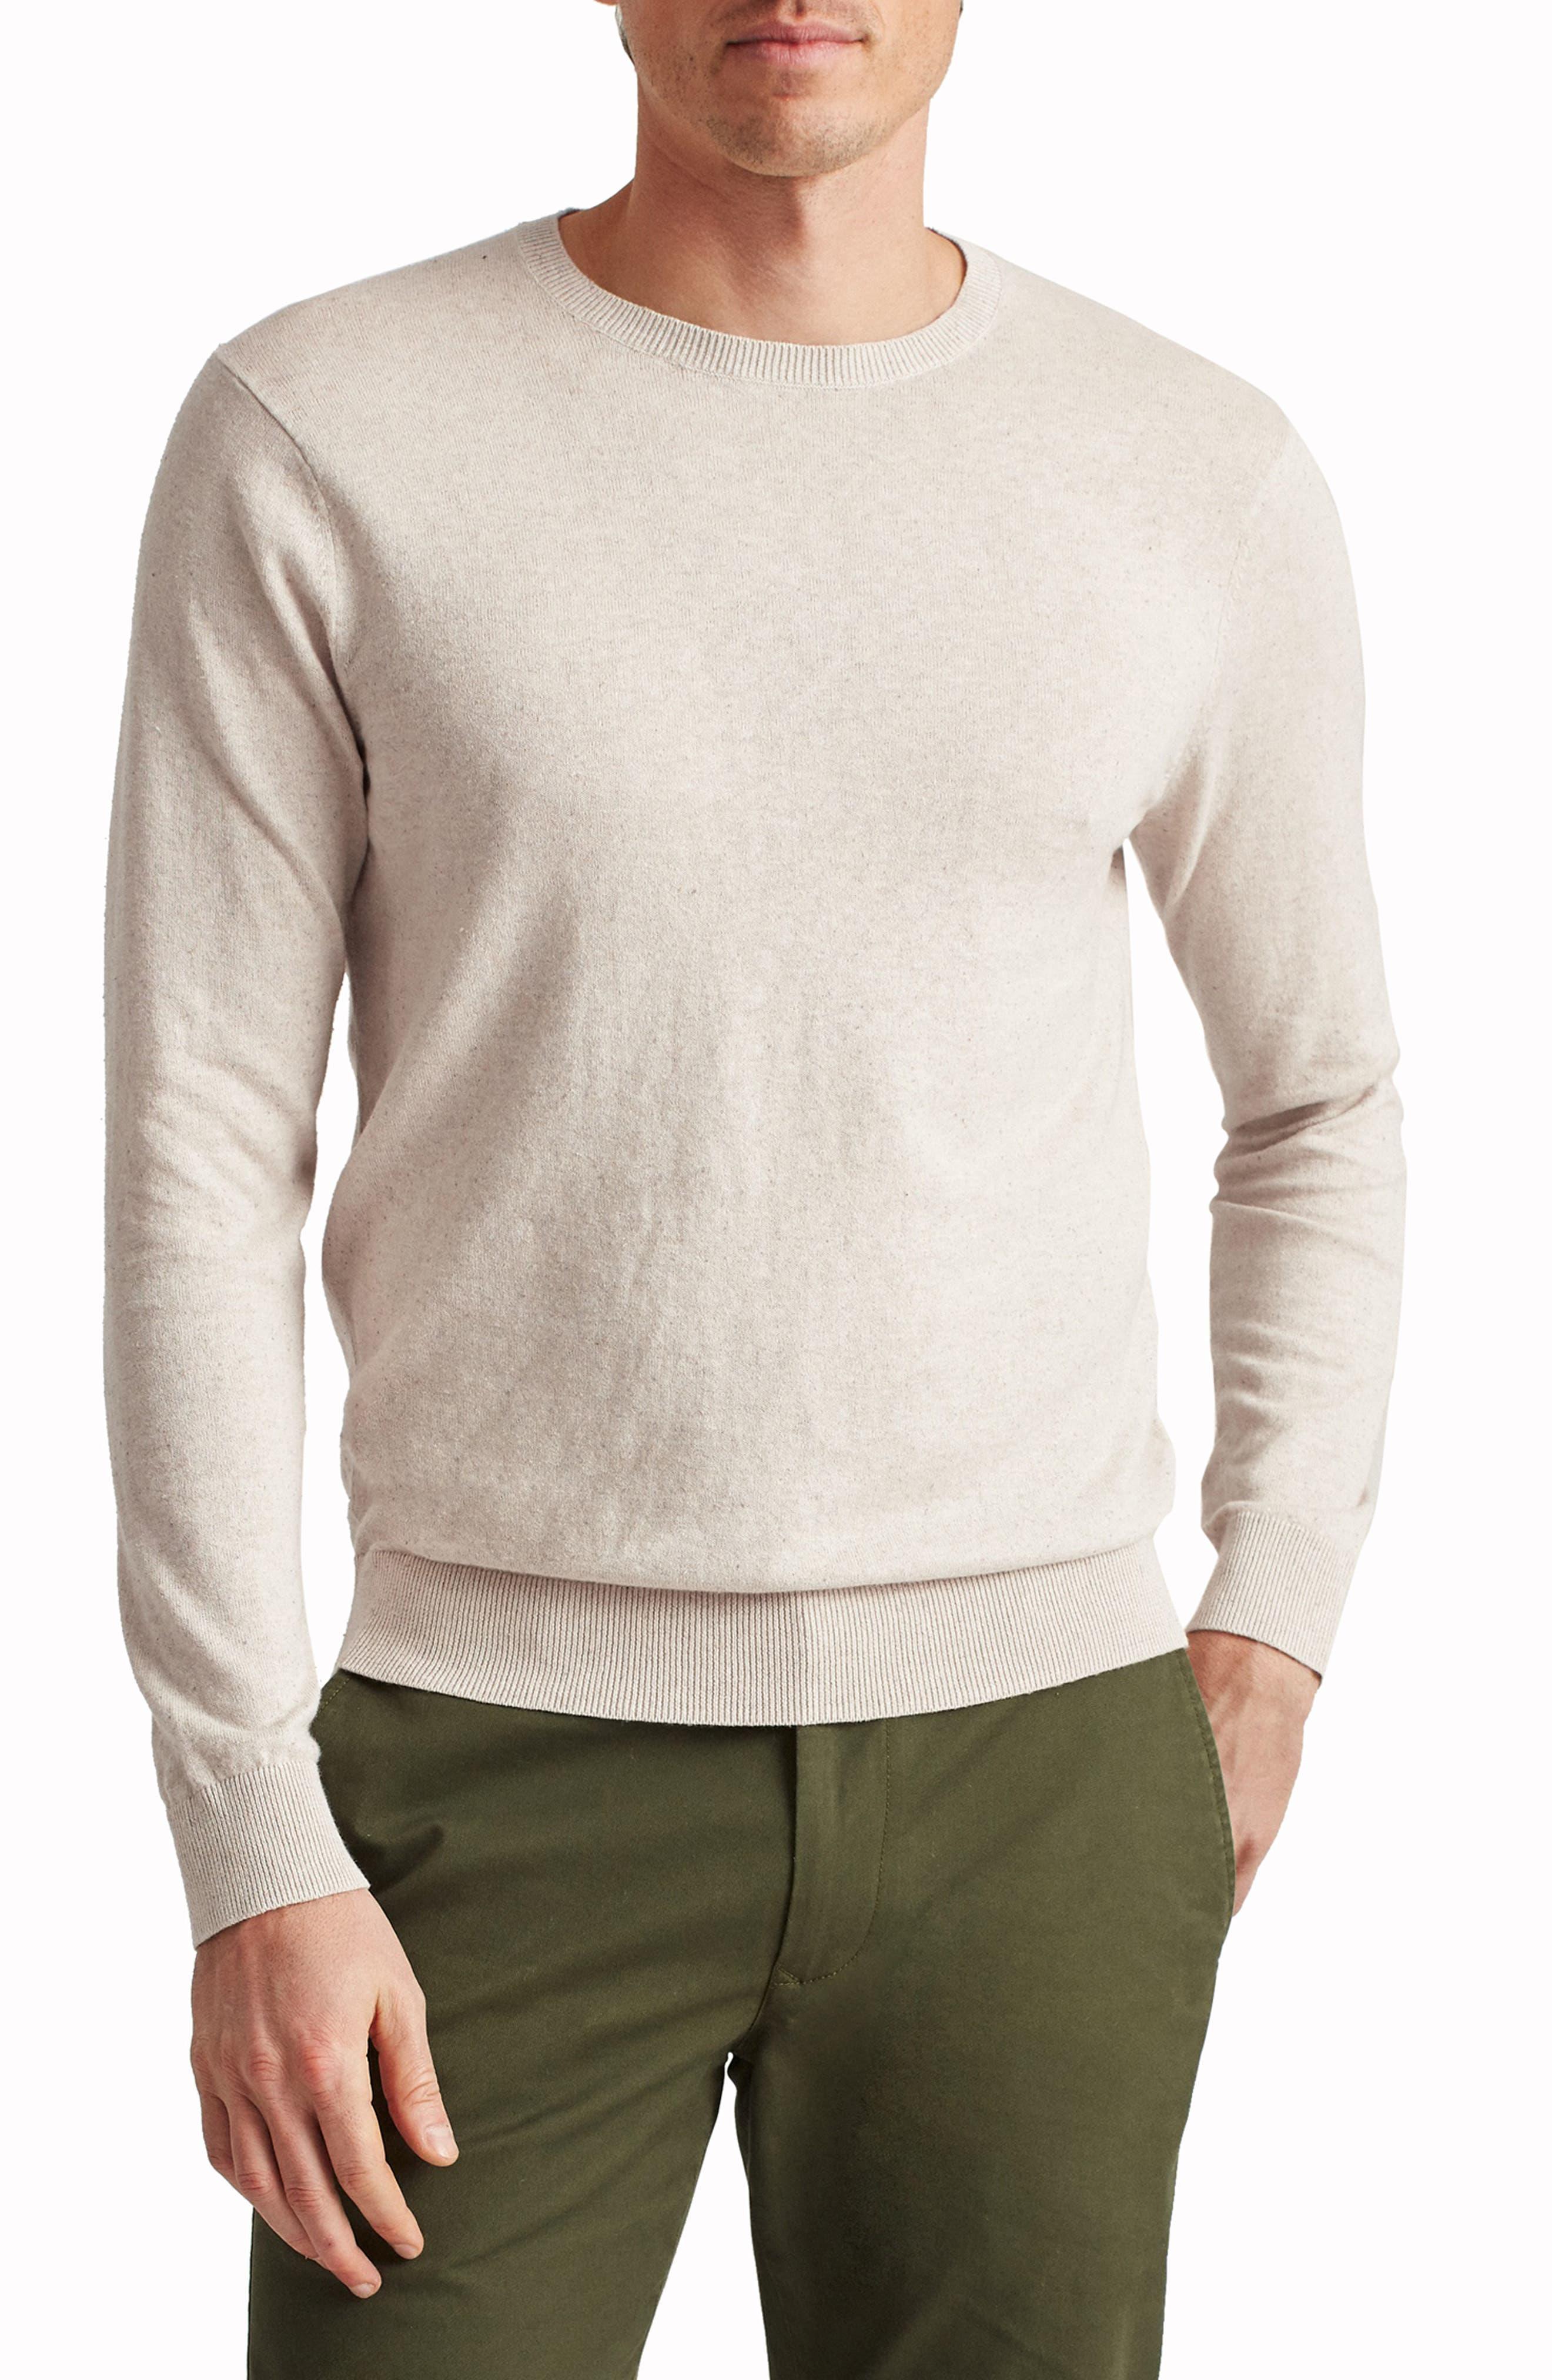 Cotton Blend Crewneck Sweater